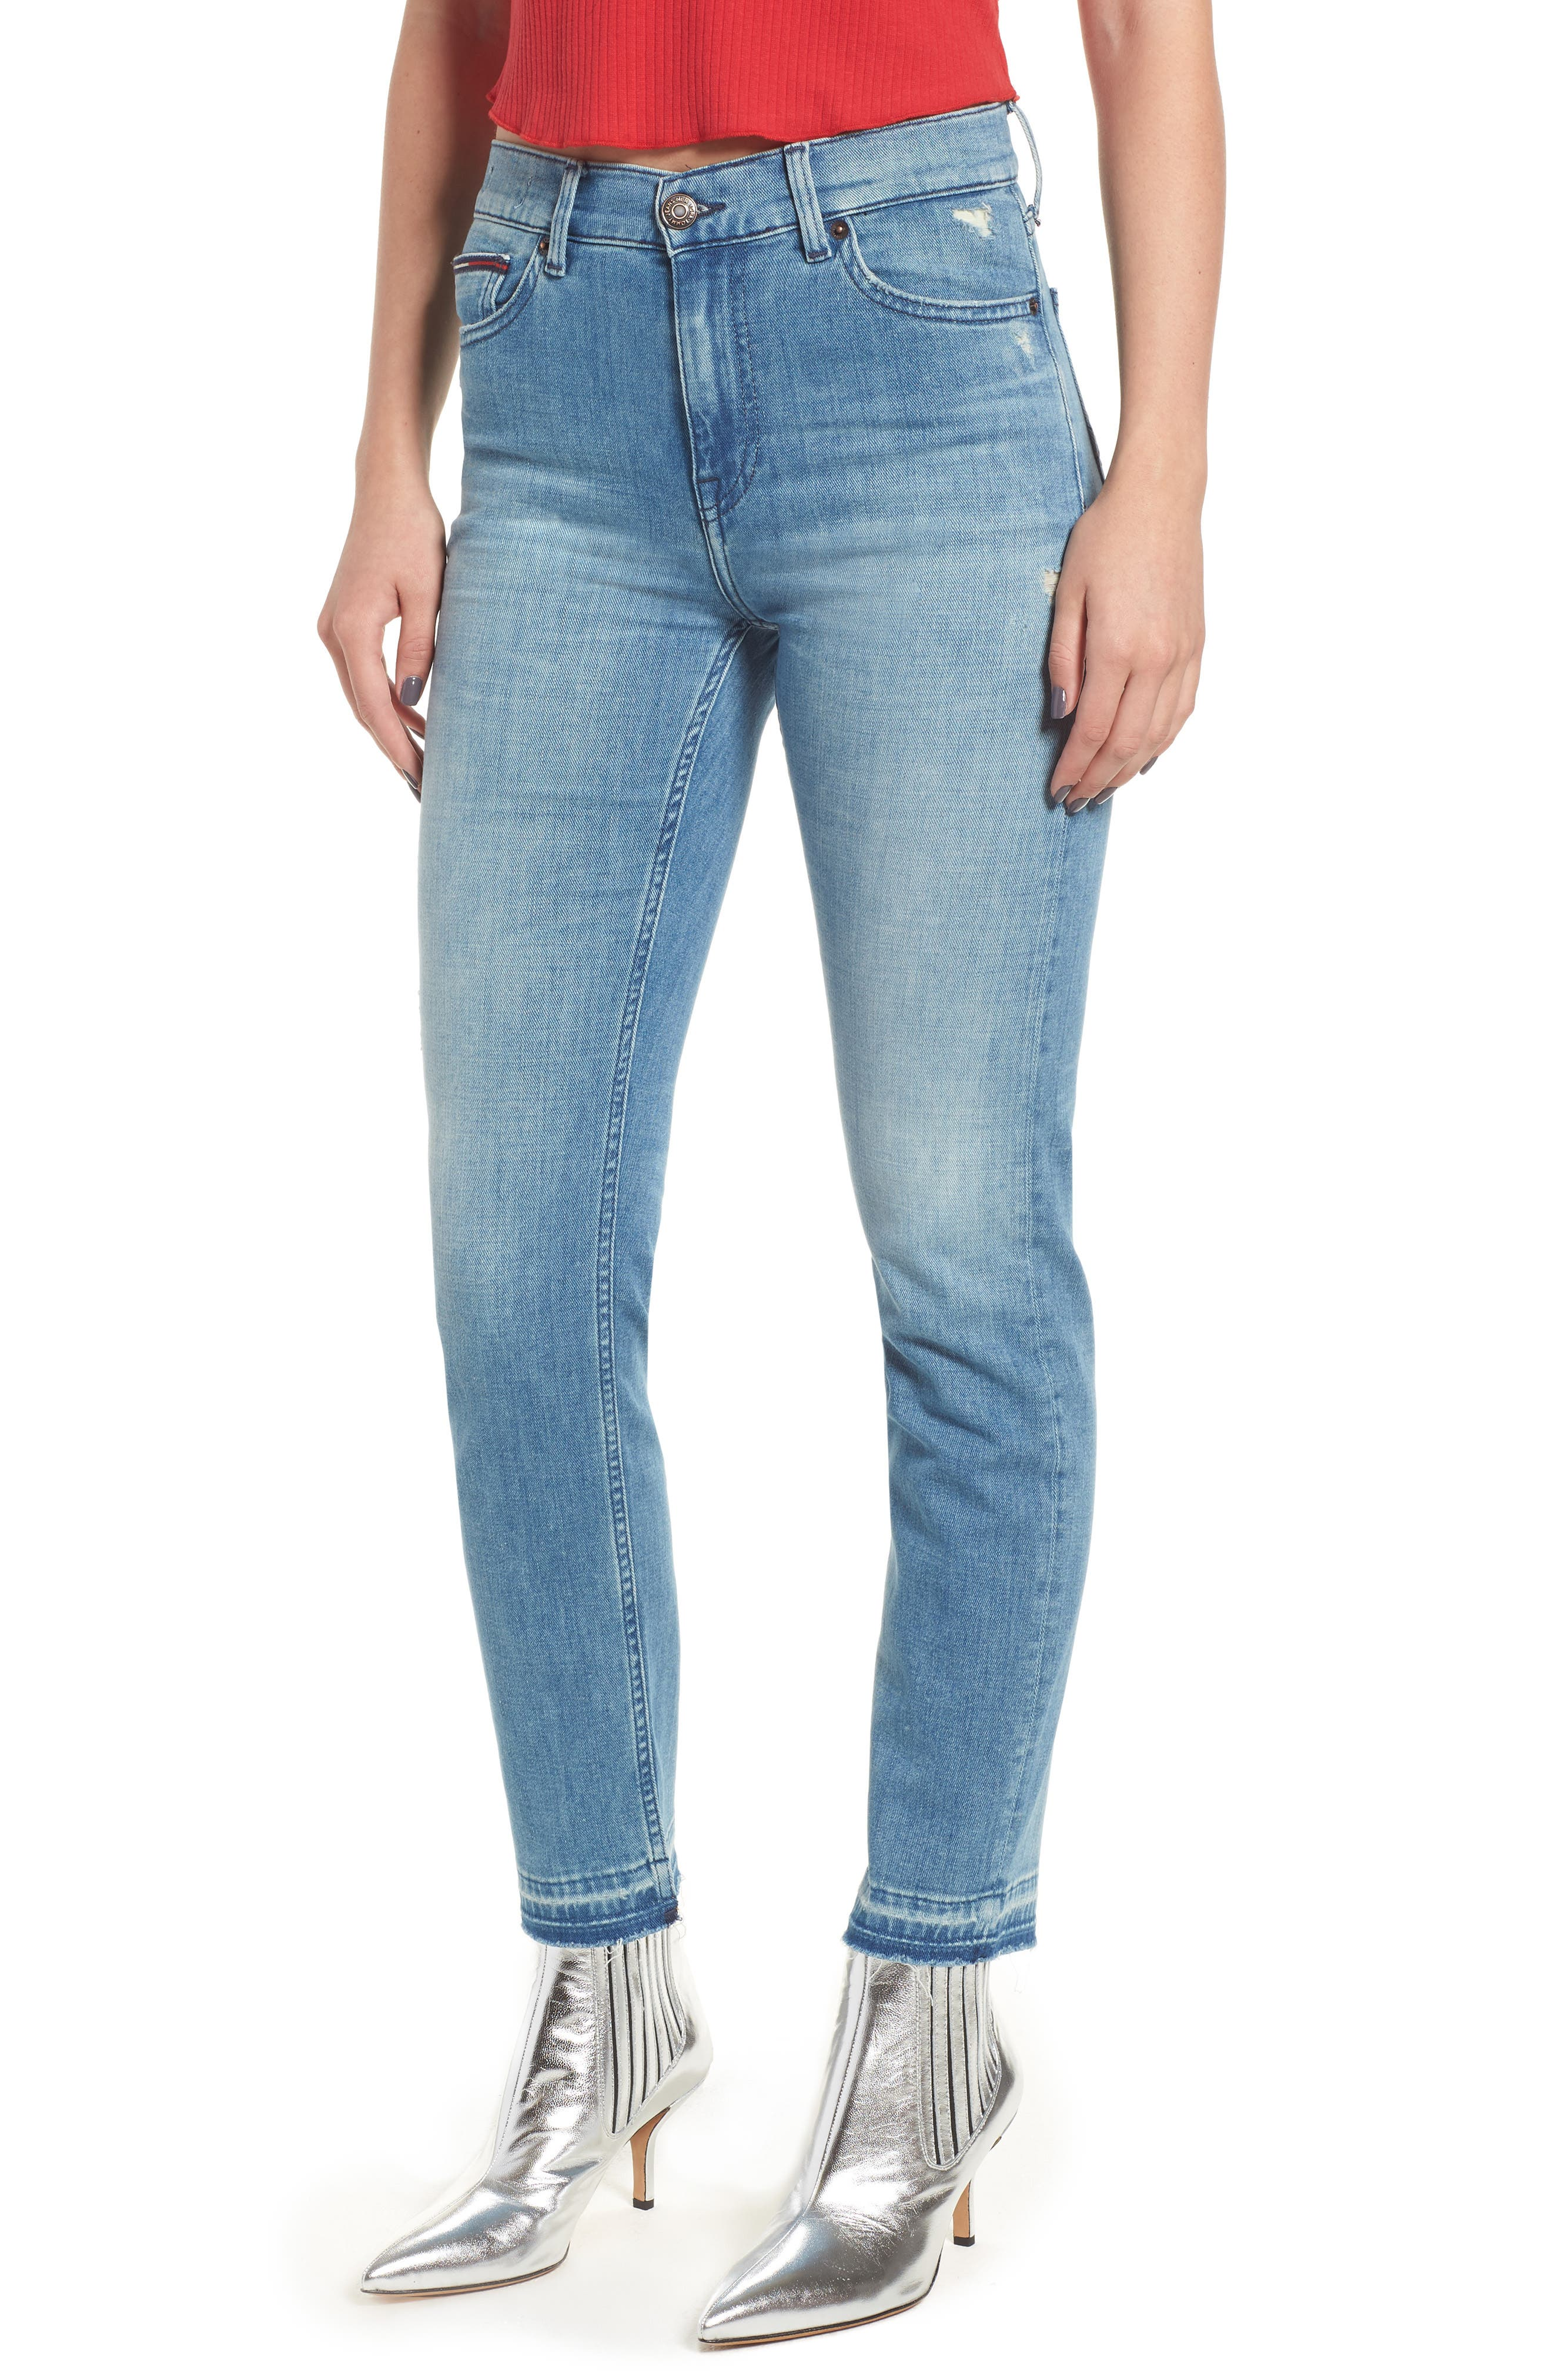 Izzy High Waist Slim Leg Jeans,                         Main,                         color, Denver Light Blue Comfort